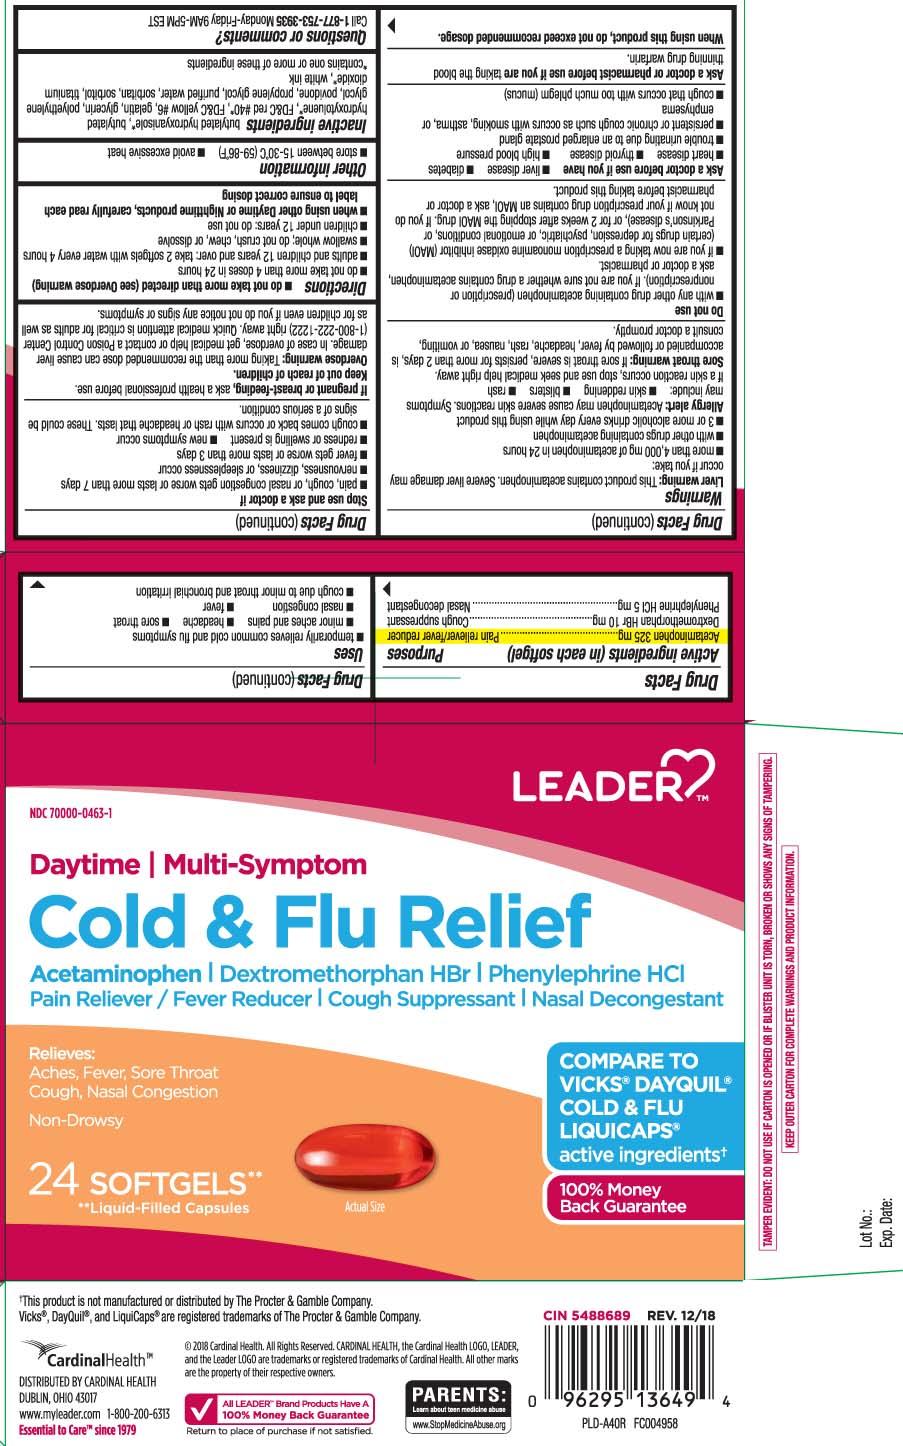 Acetaminophen 325 mg, Dextromethorphan HBr 10 mg, Phenylephrine HCI 5 mg